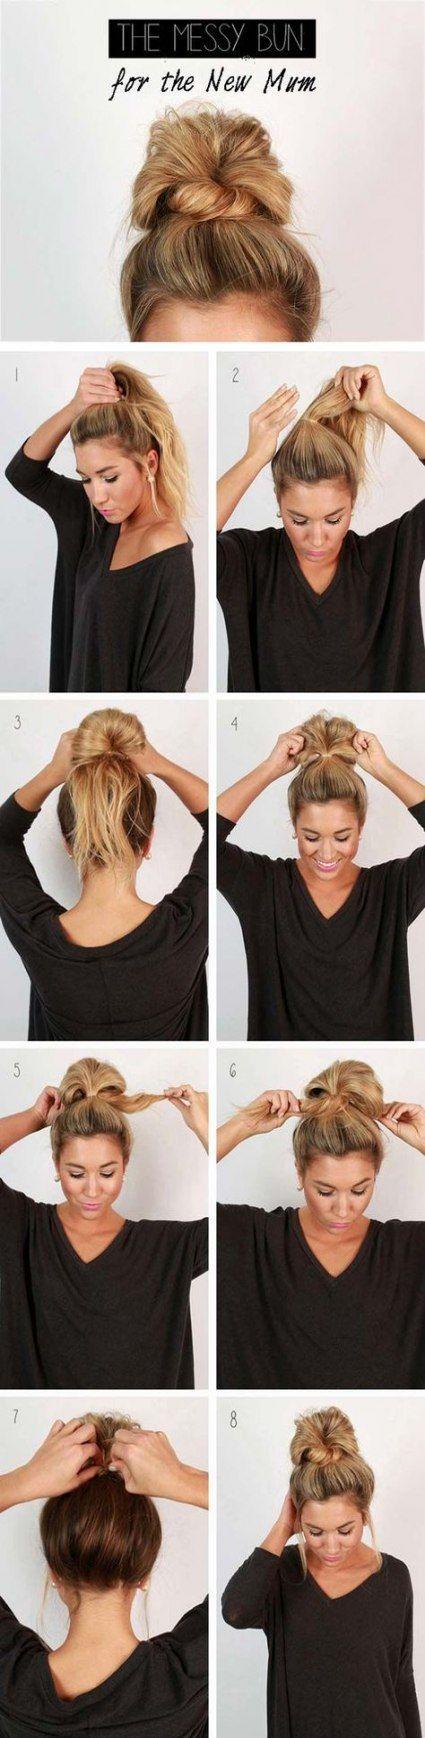 52 Ideas Hair Styles Tutorial Wedding Messy Buns